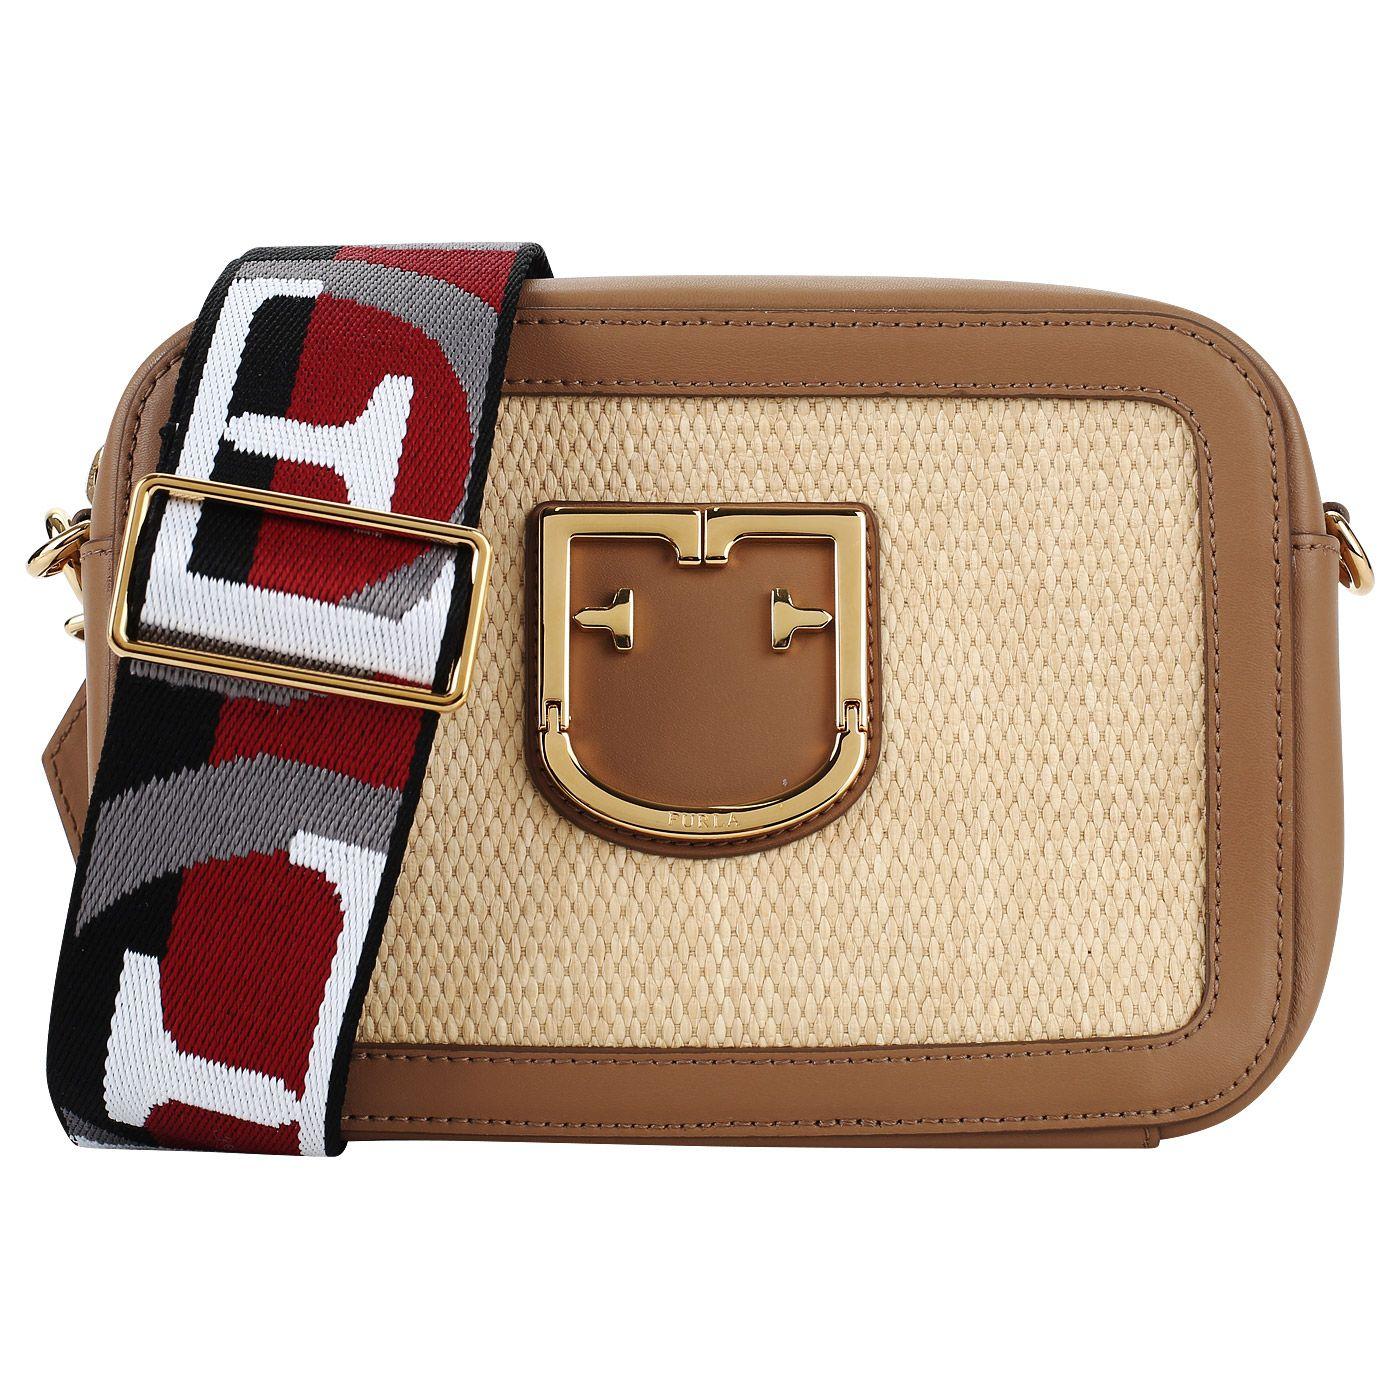 fad252f51e67 По-настоящему летняя сумка с ярким ремешком. Широкий плечевой ремешок  гарантирует удобство при носке